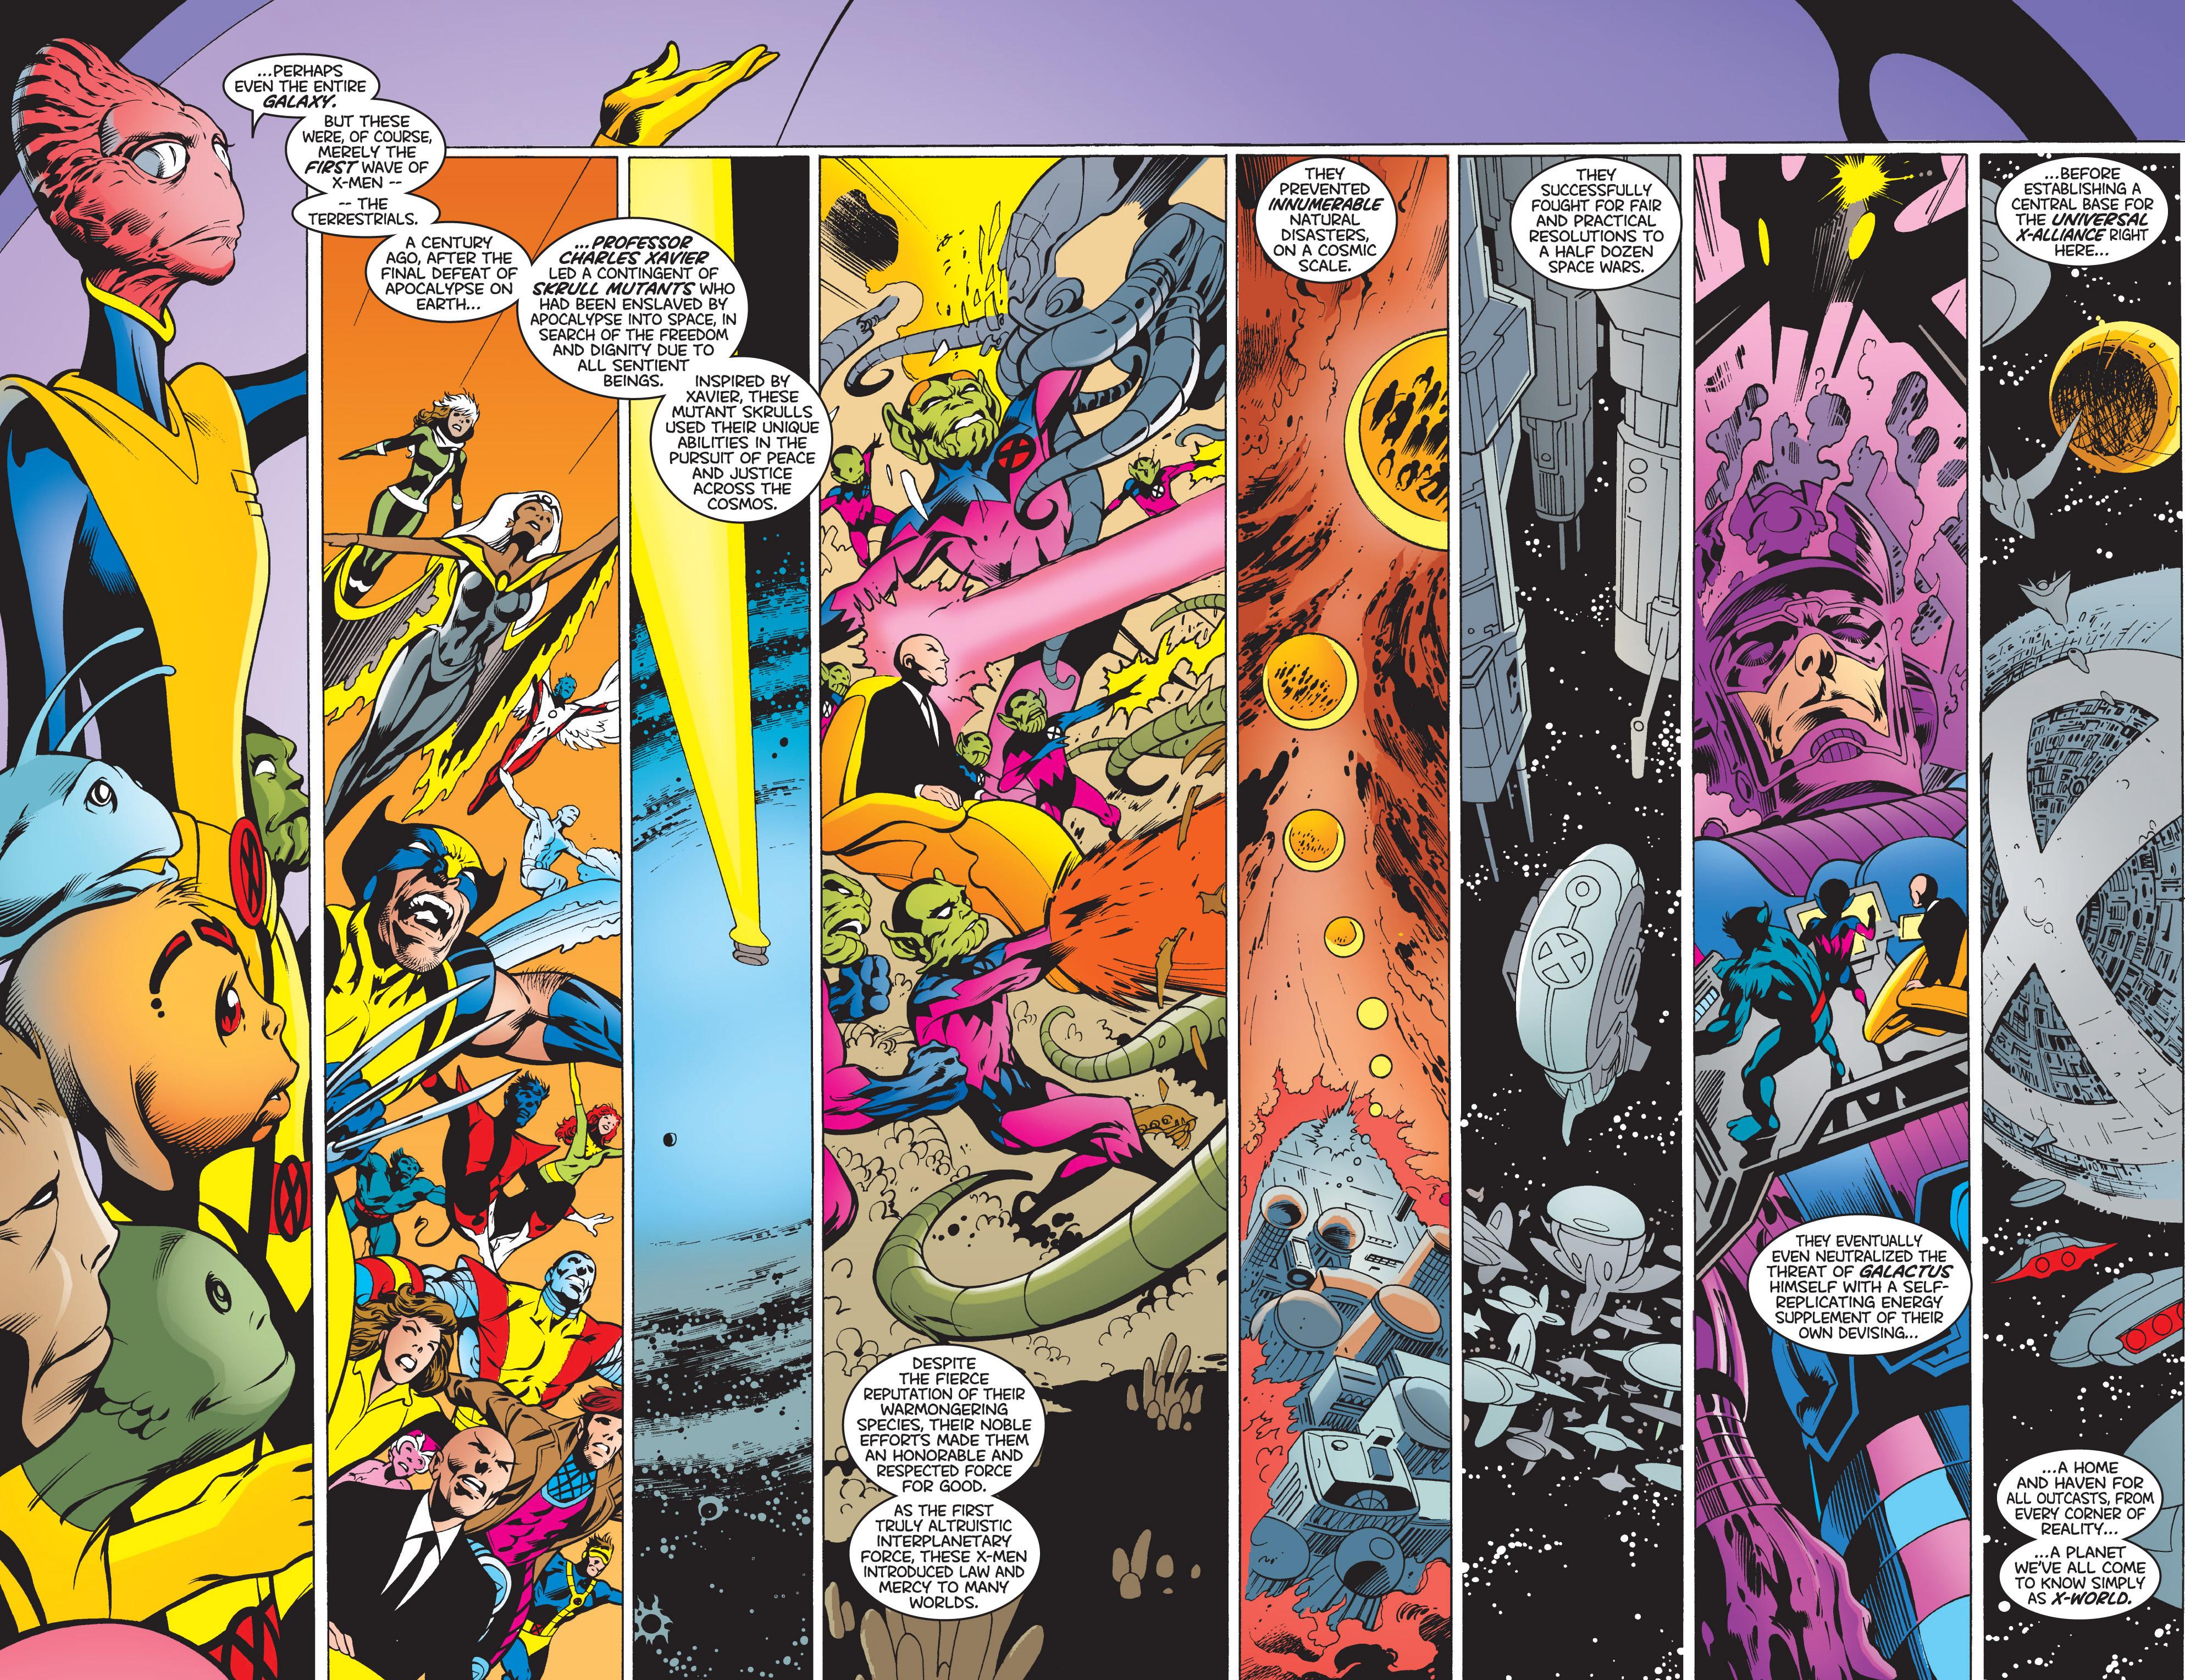 X-Men (1991) 98 Page 2